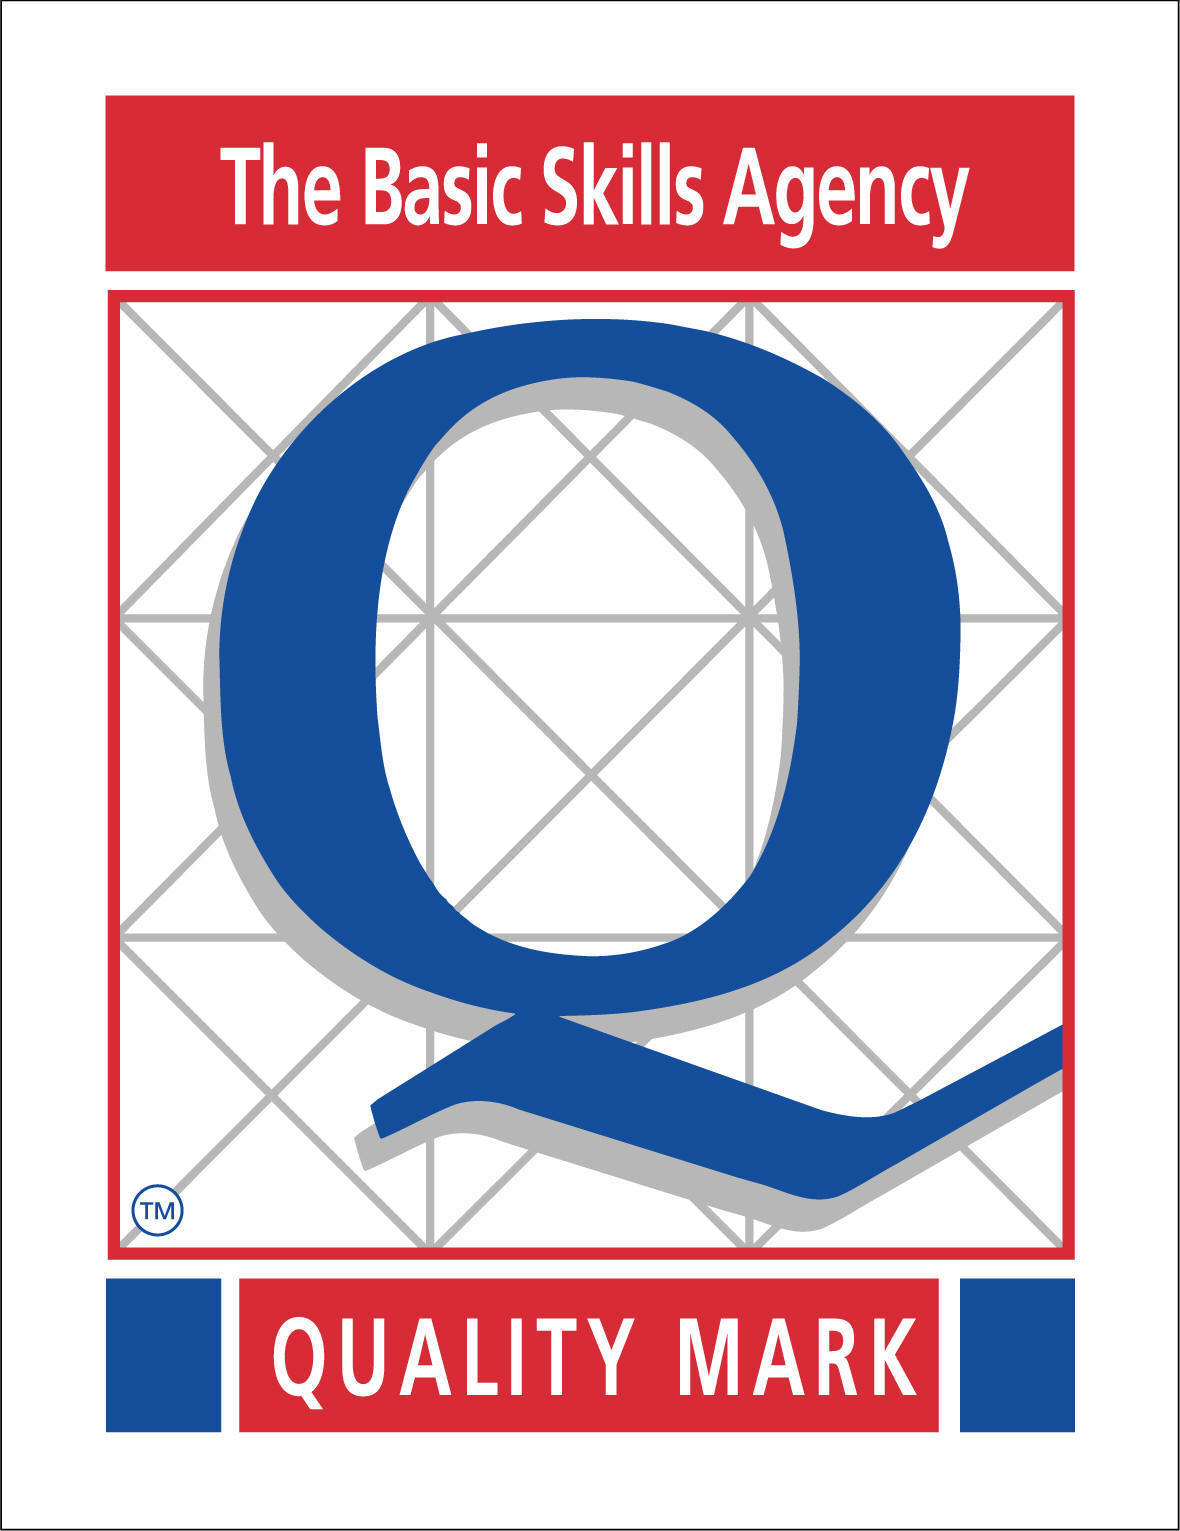 http://www.staidansschool.co.uk/wp-content/uploads/2018/07/QualityMark.jpg